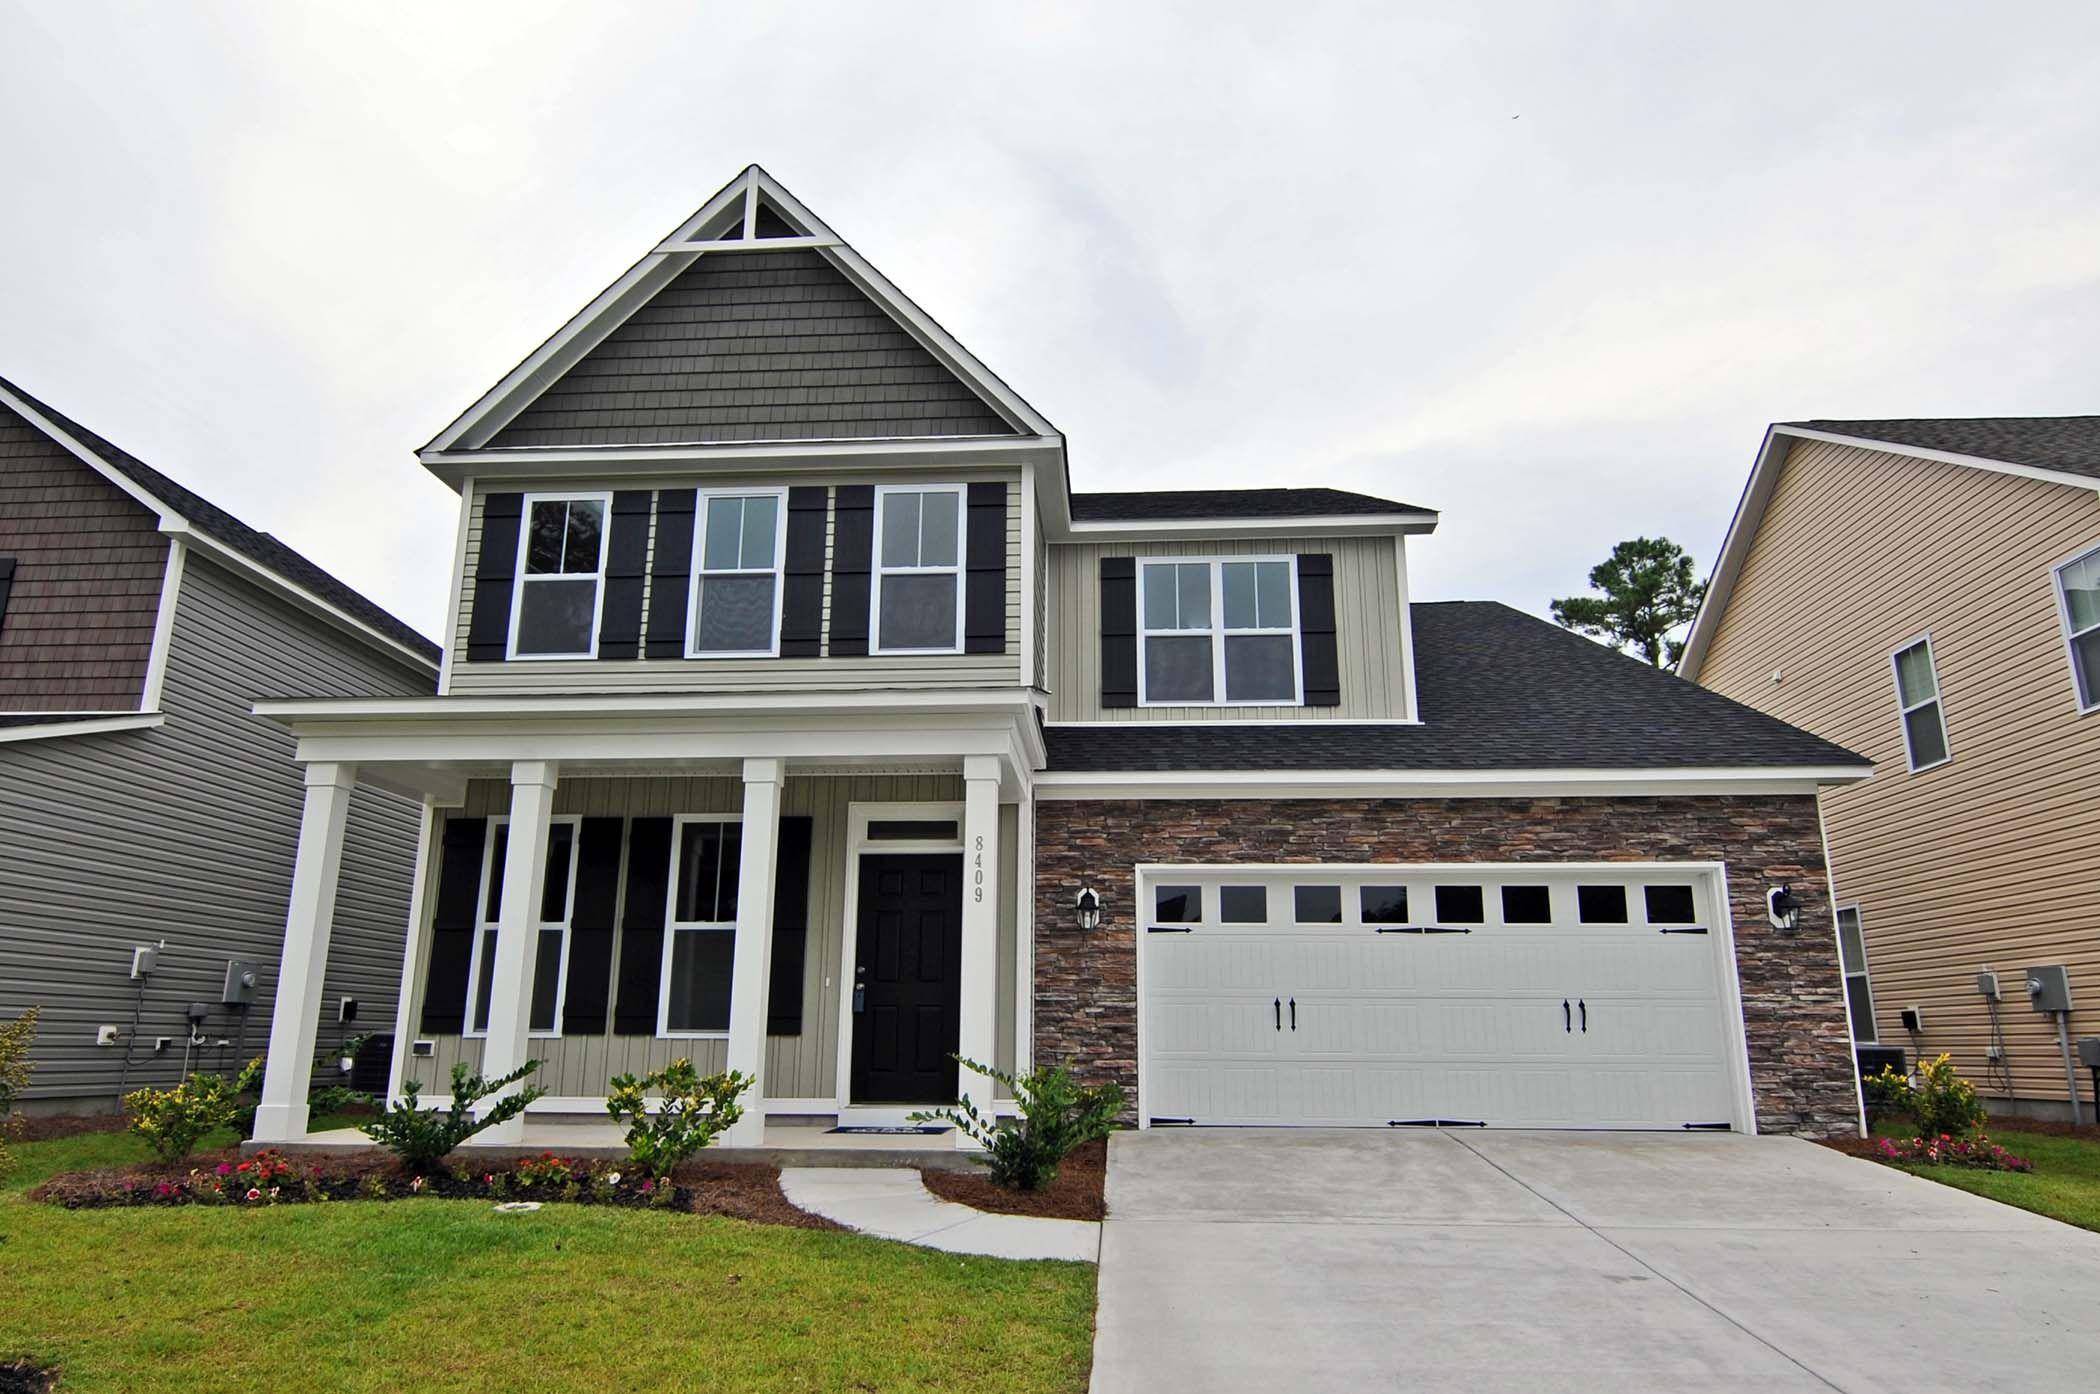 8409 Rosemary Lane $270,560 Jordan Floor Plan 3,090 sq ft  6 beds, 3.5 baths Move In Ready